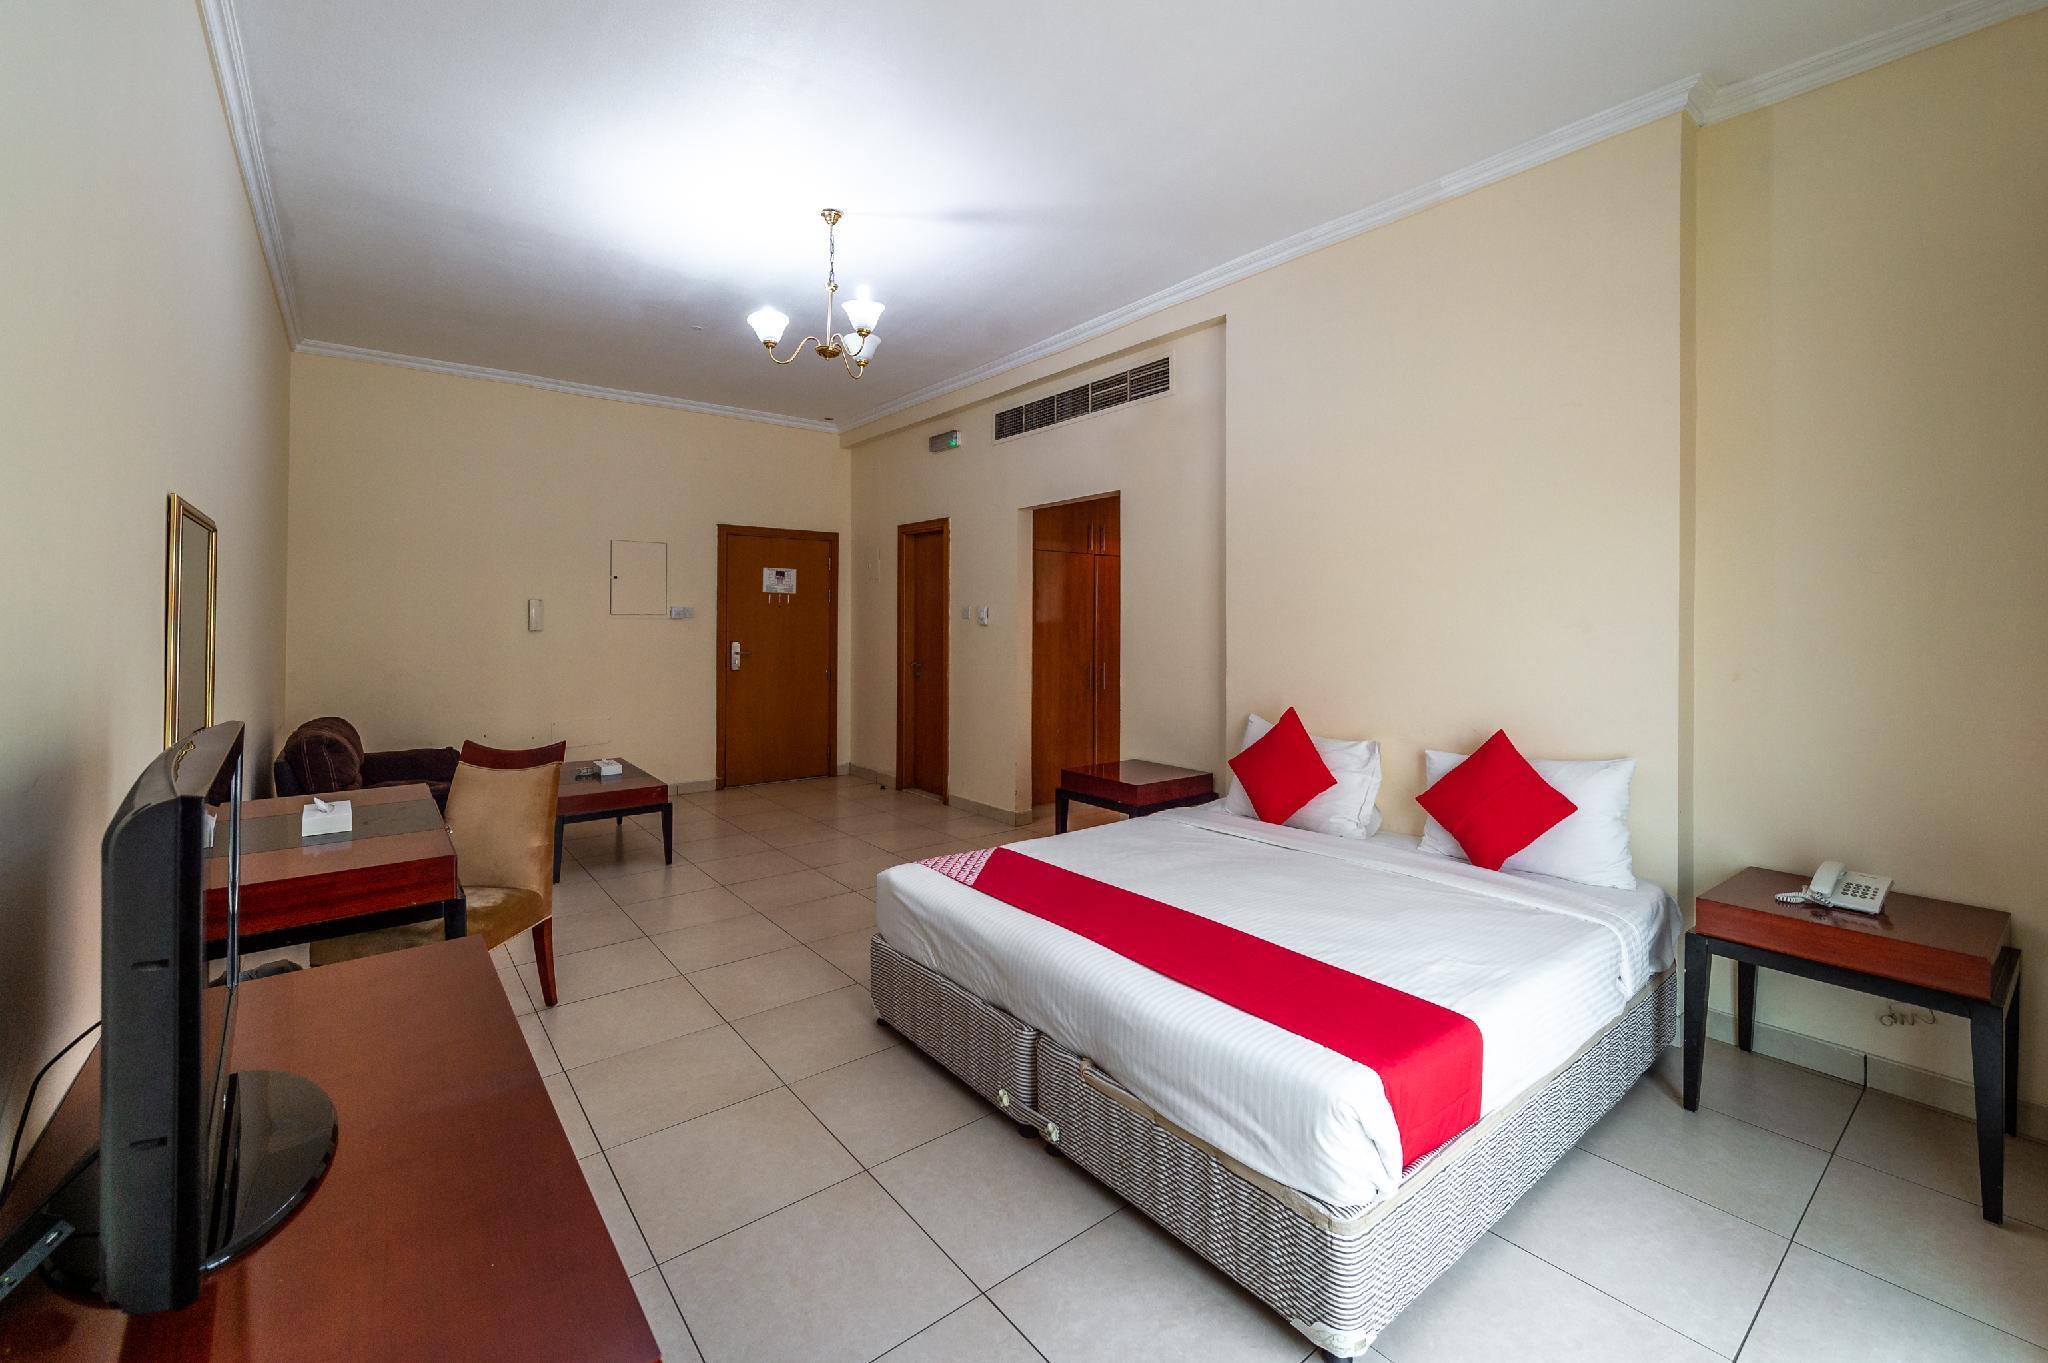 OYO 132 Ruwi Hotel Apartments – Sharjah 2